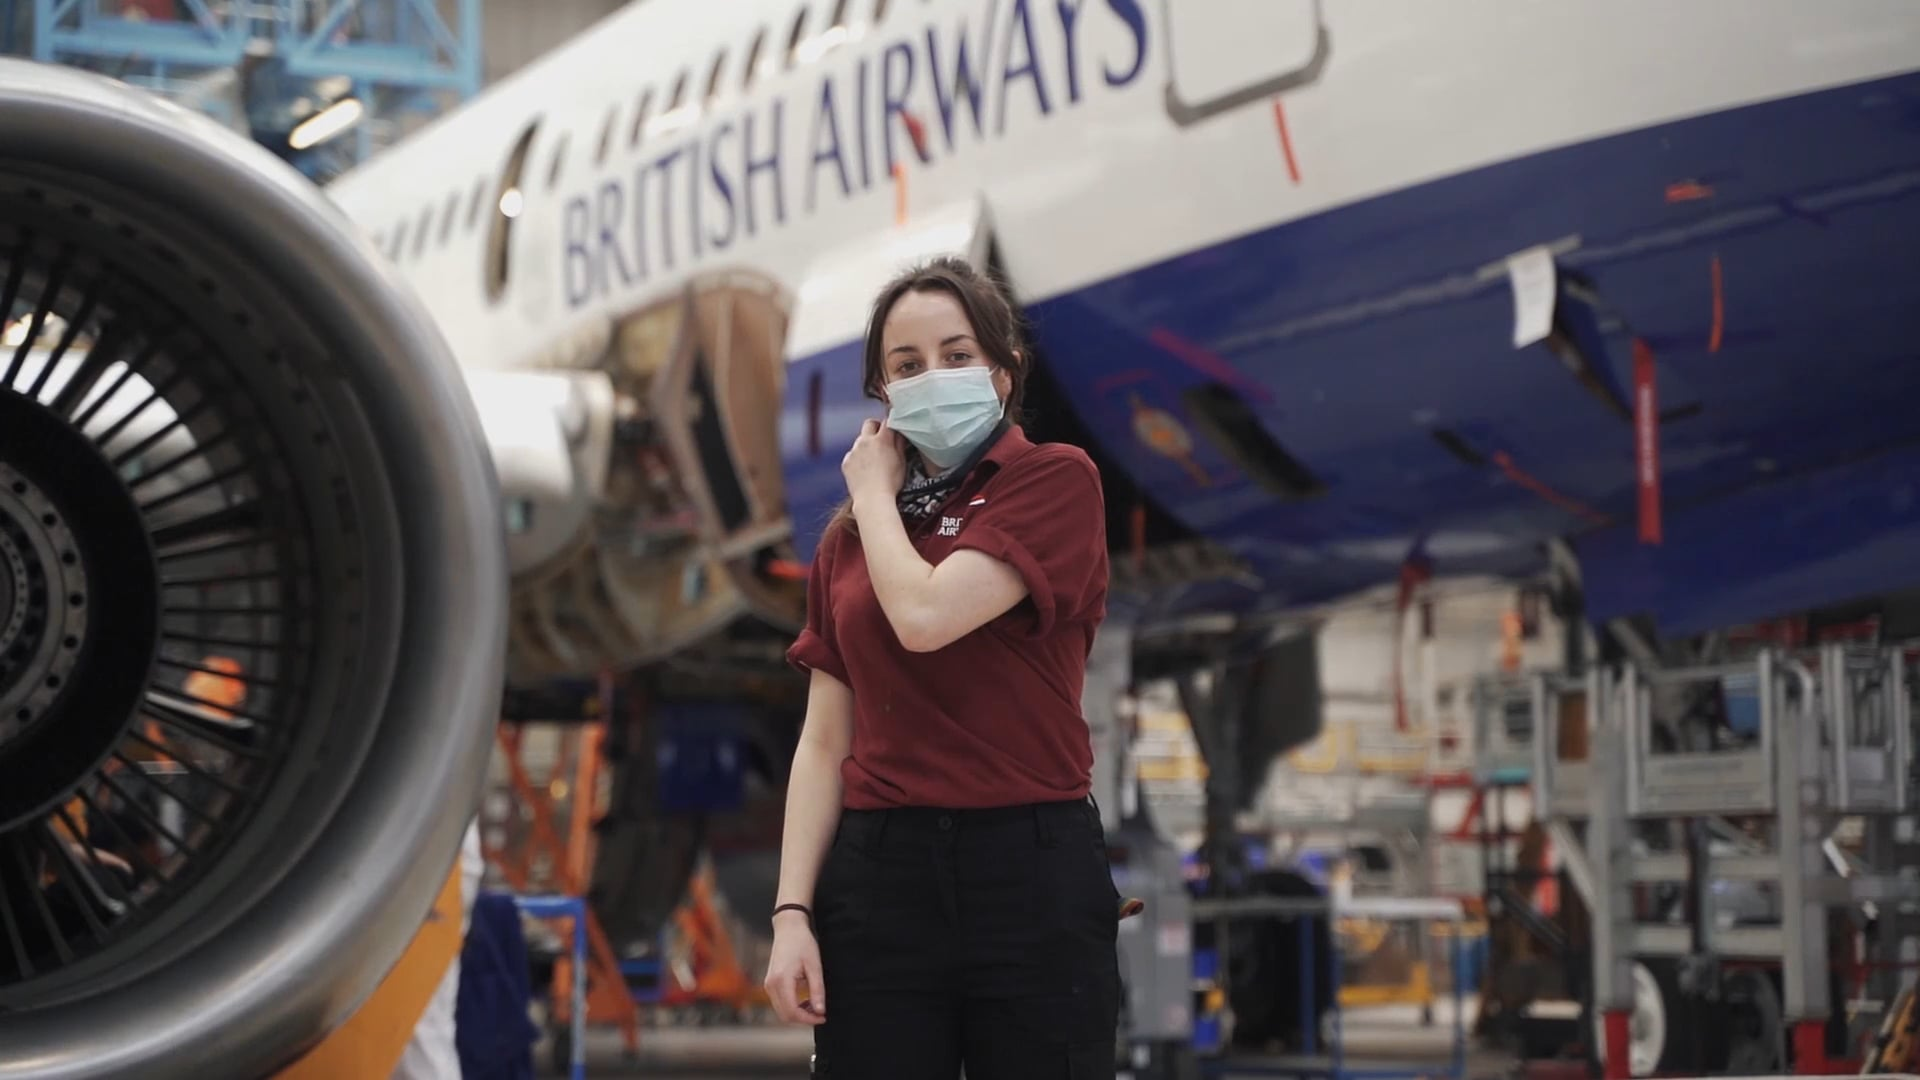 British Airways Flying Start - Red Nose Day Compilation